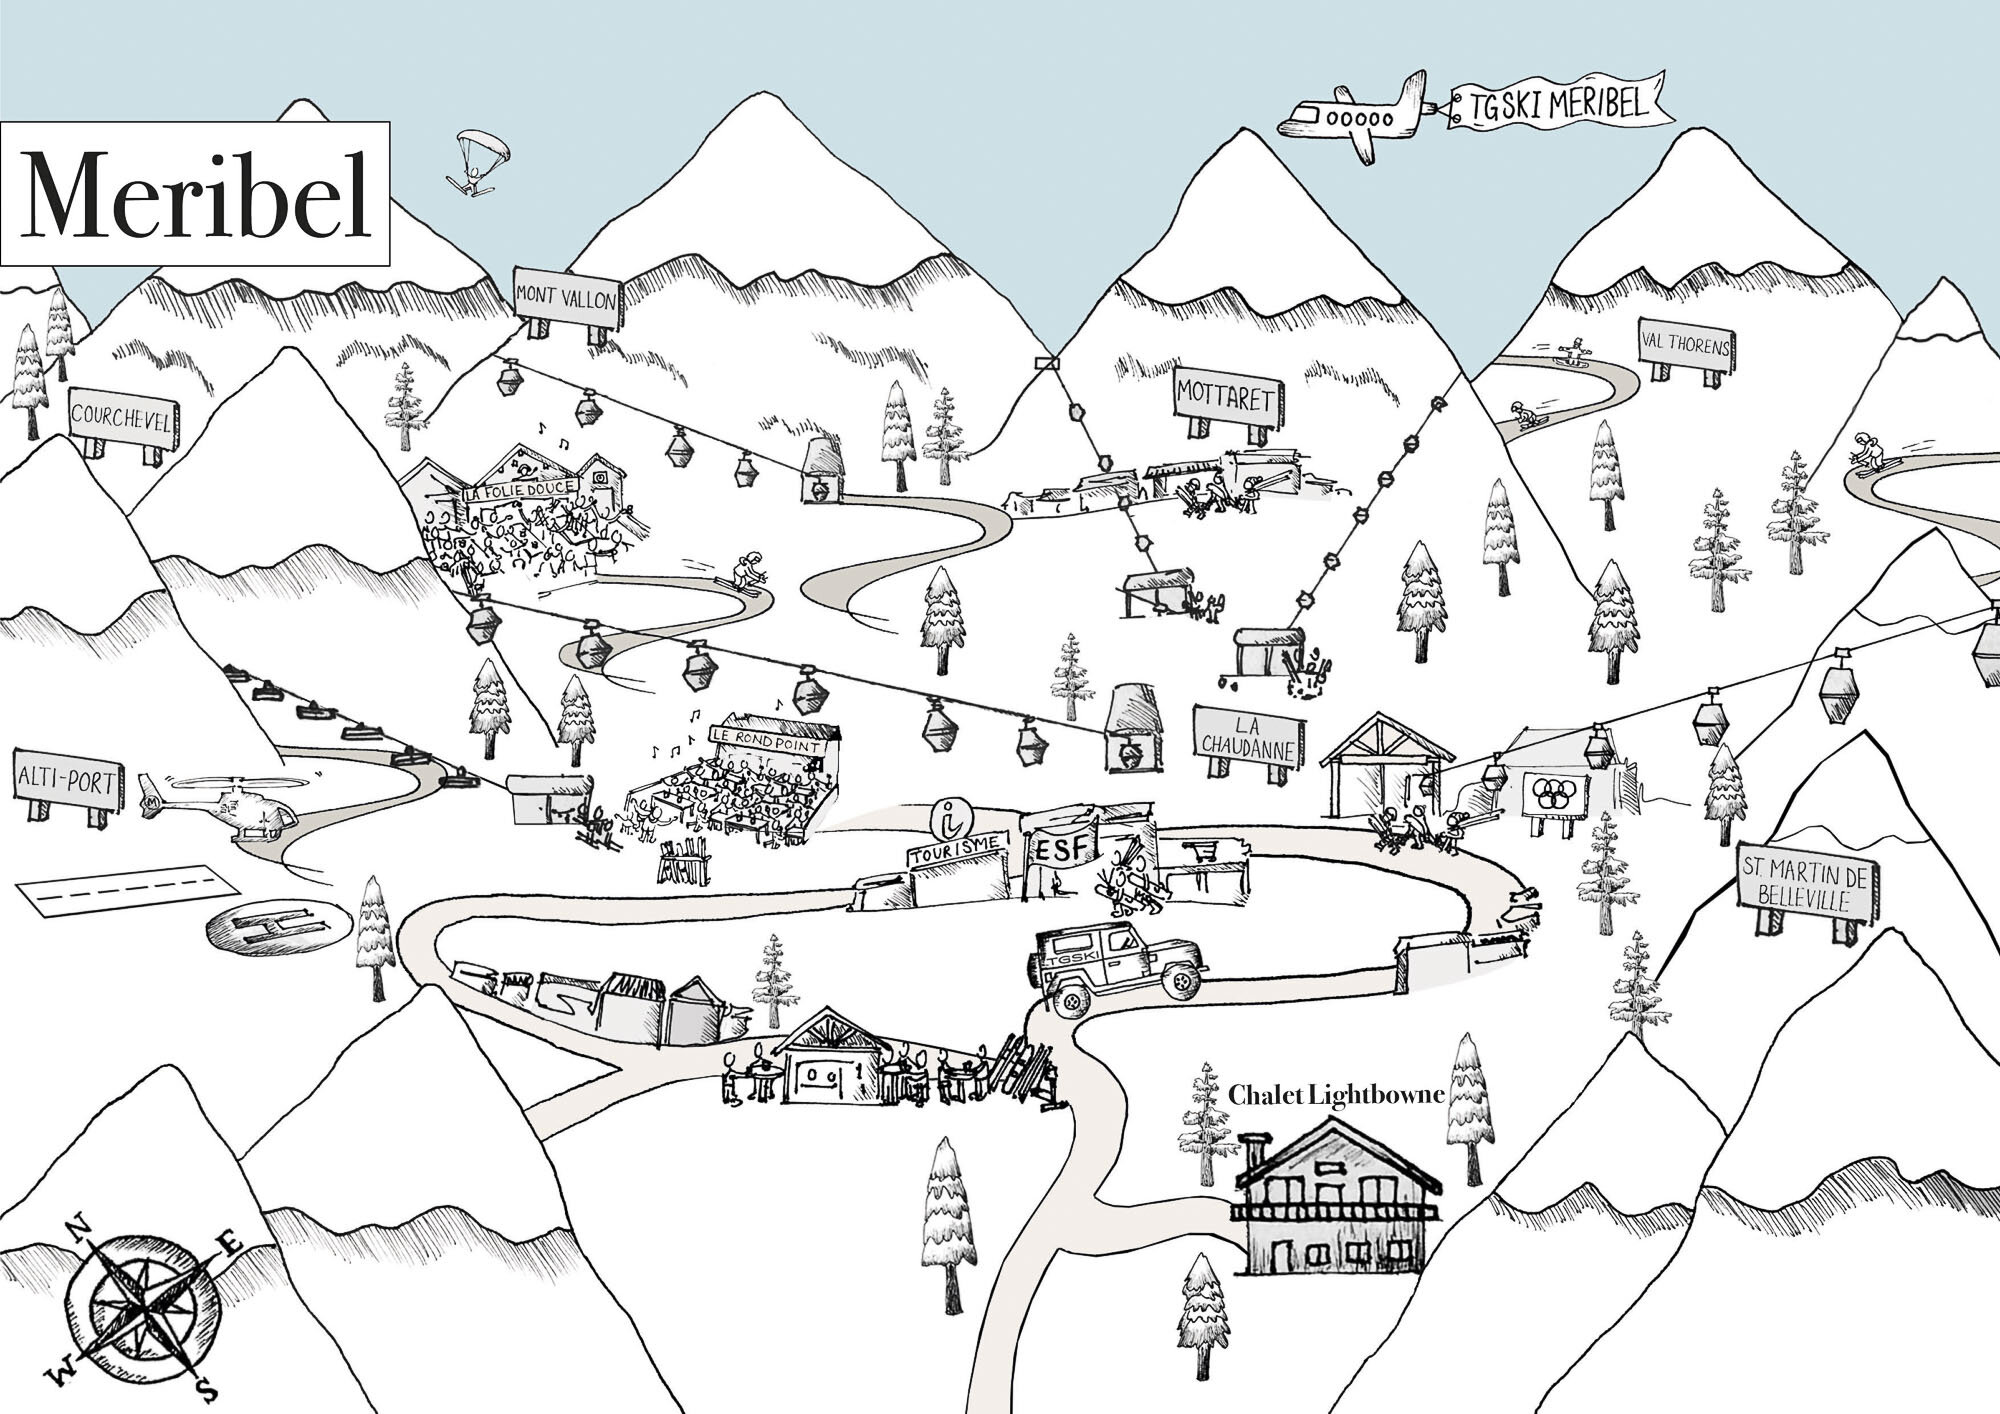 luxury-ski-chalet-map-of-meriebl.jpg